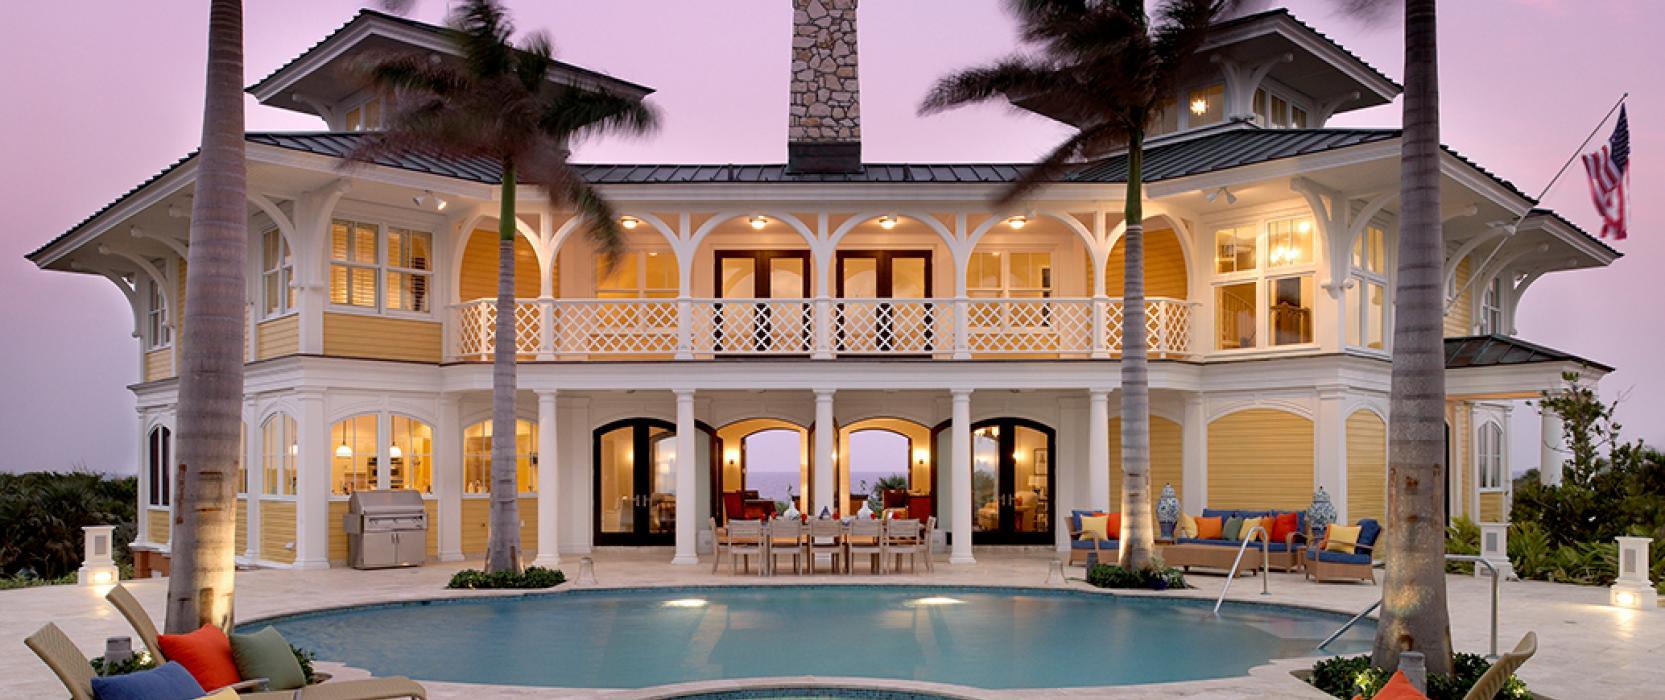 Architecture New England, Manhattan, Miami, California, the Carolinas, Nevis, the Bahamas